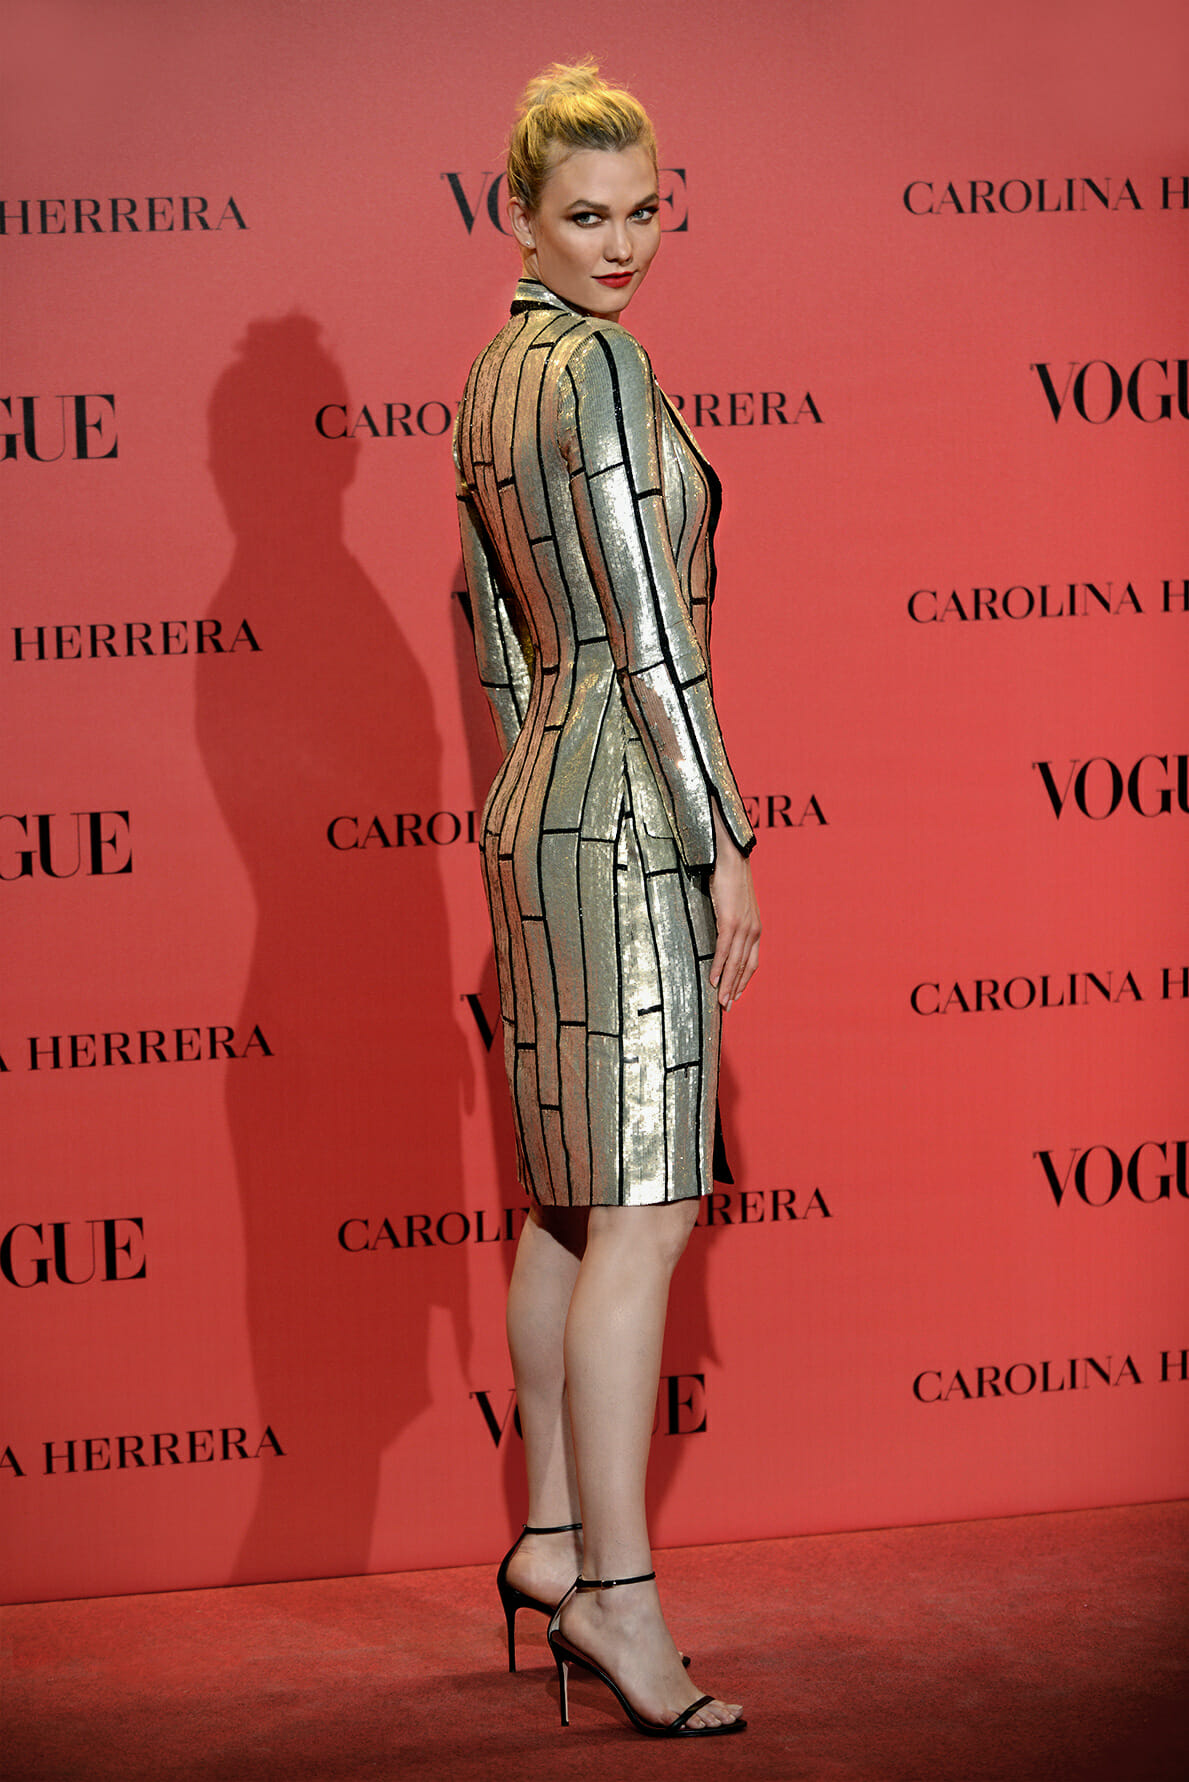 ch-carolina-herrera-fashion-vogue-party-influencers-homepage-banner-image-karlie-kloss